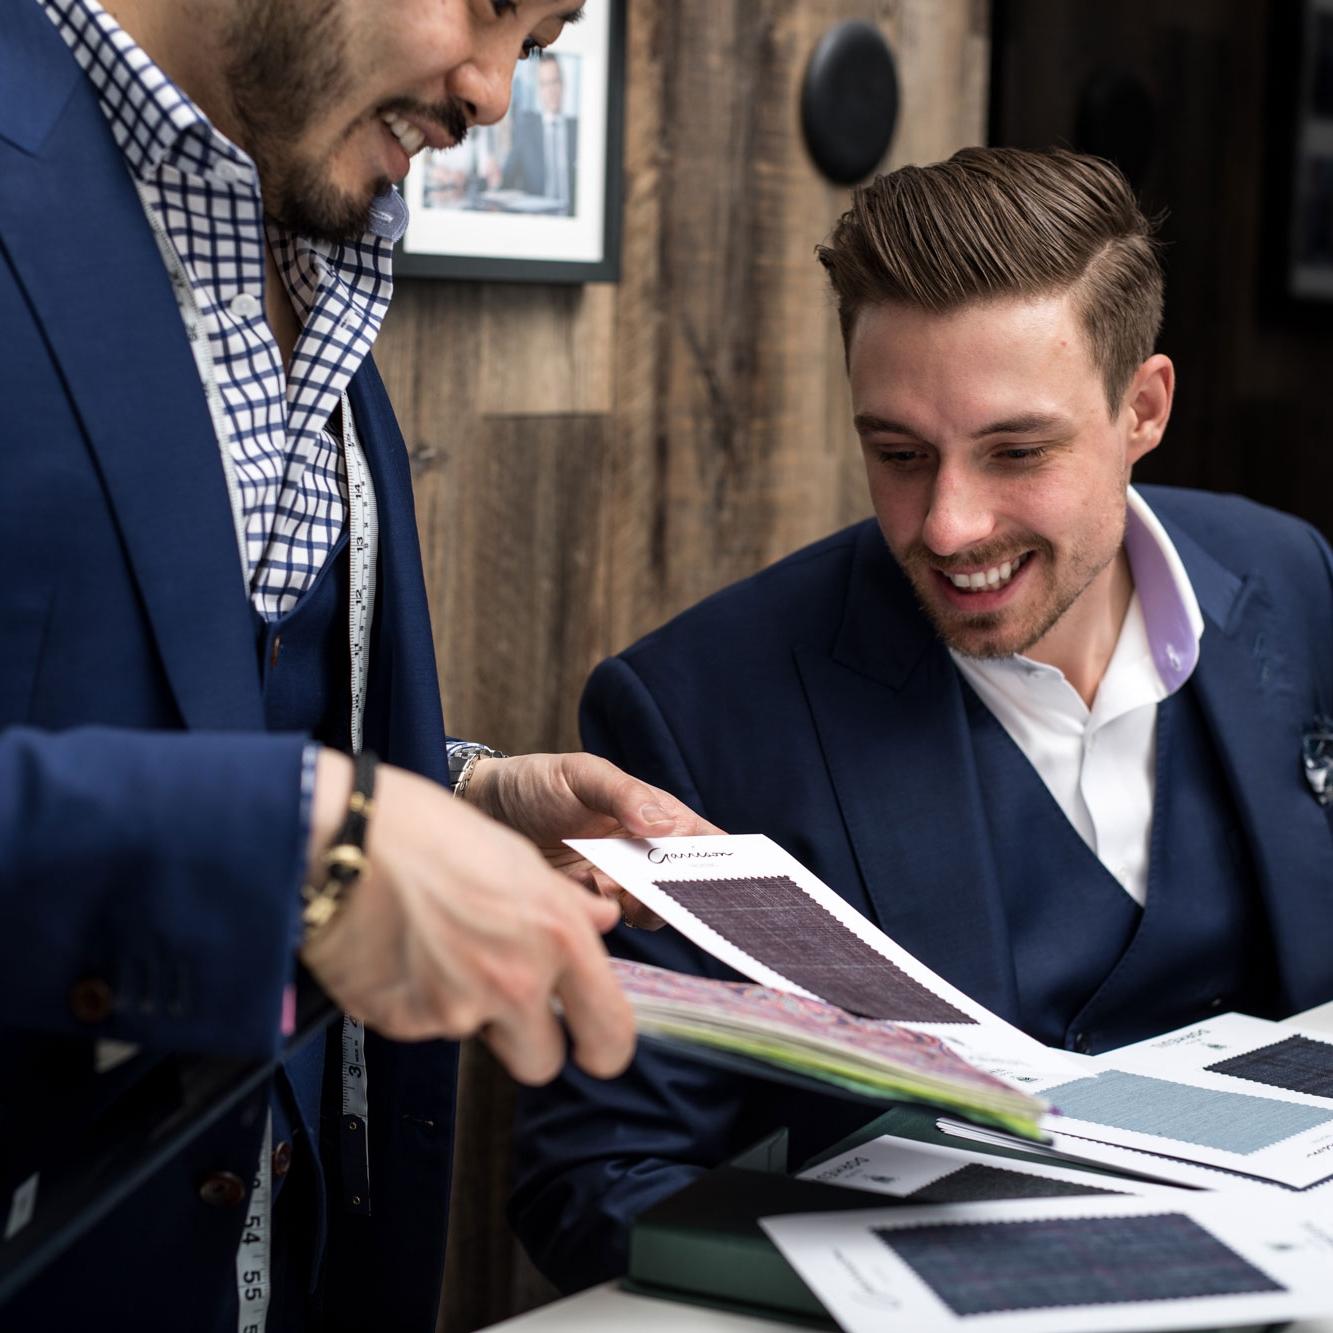 Complimentary-wardrobe-styling-advice-custom-suit.jpg